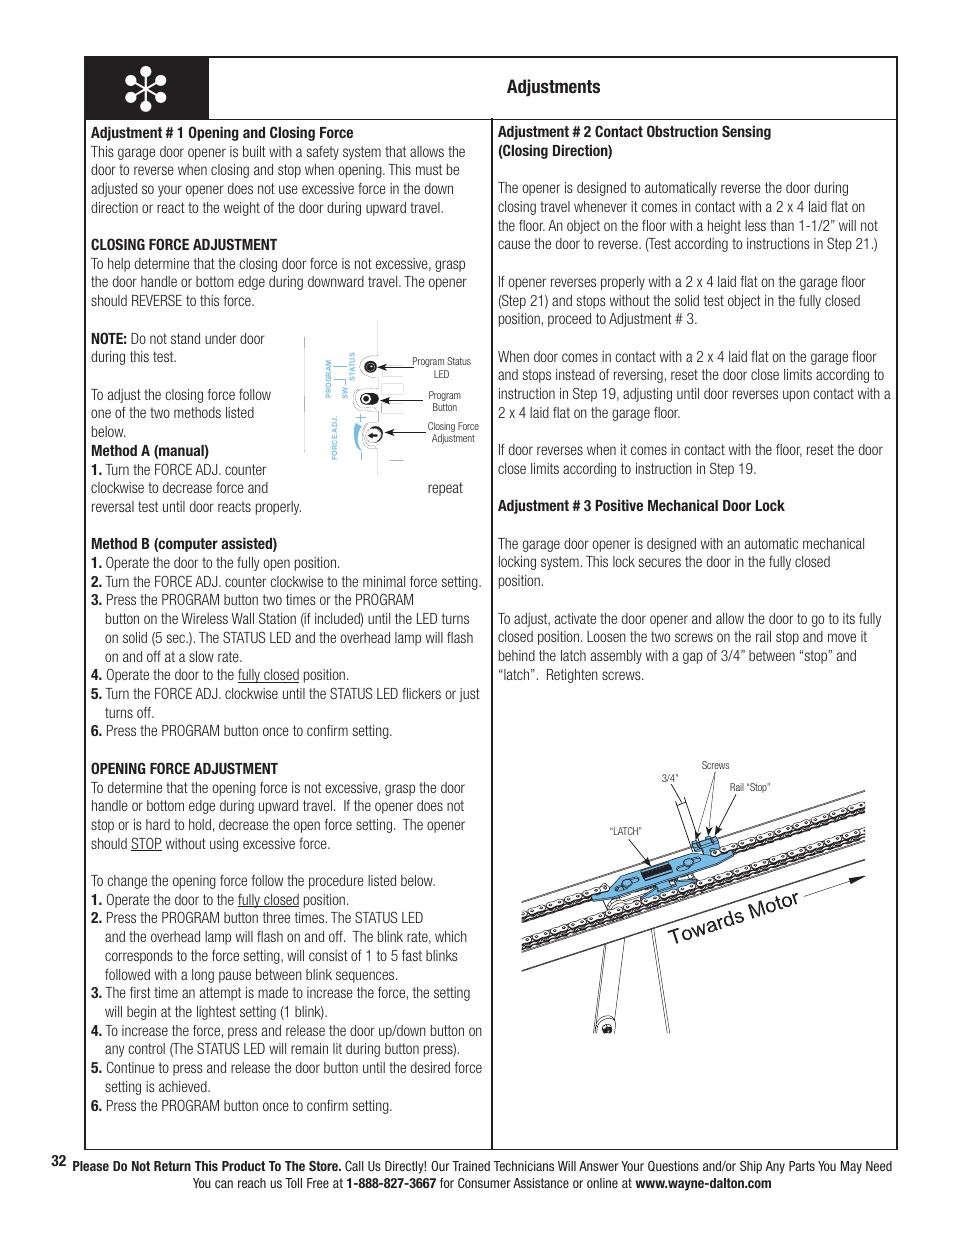 adjustments wayne dalton prodrive 3222c z user manual page 38 rh manualsdir com wayne dalton idrive owners manual wayne dalton 2115 owners manual